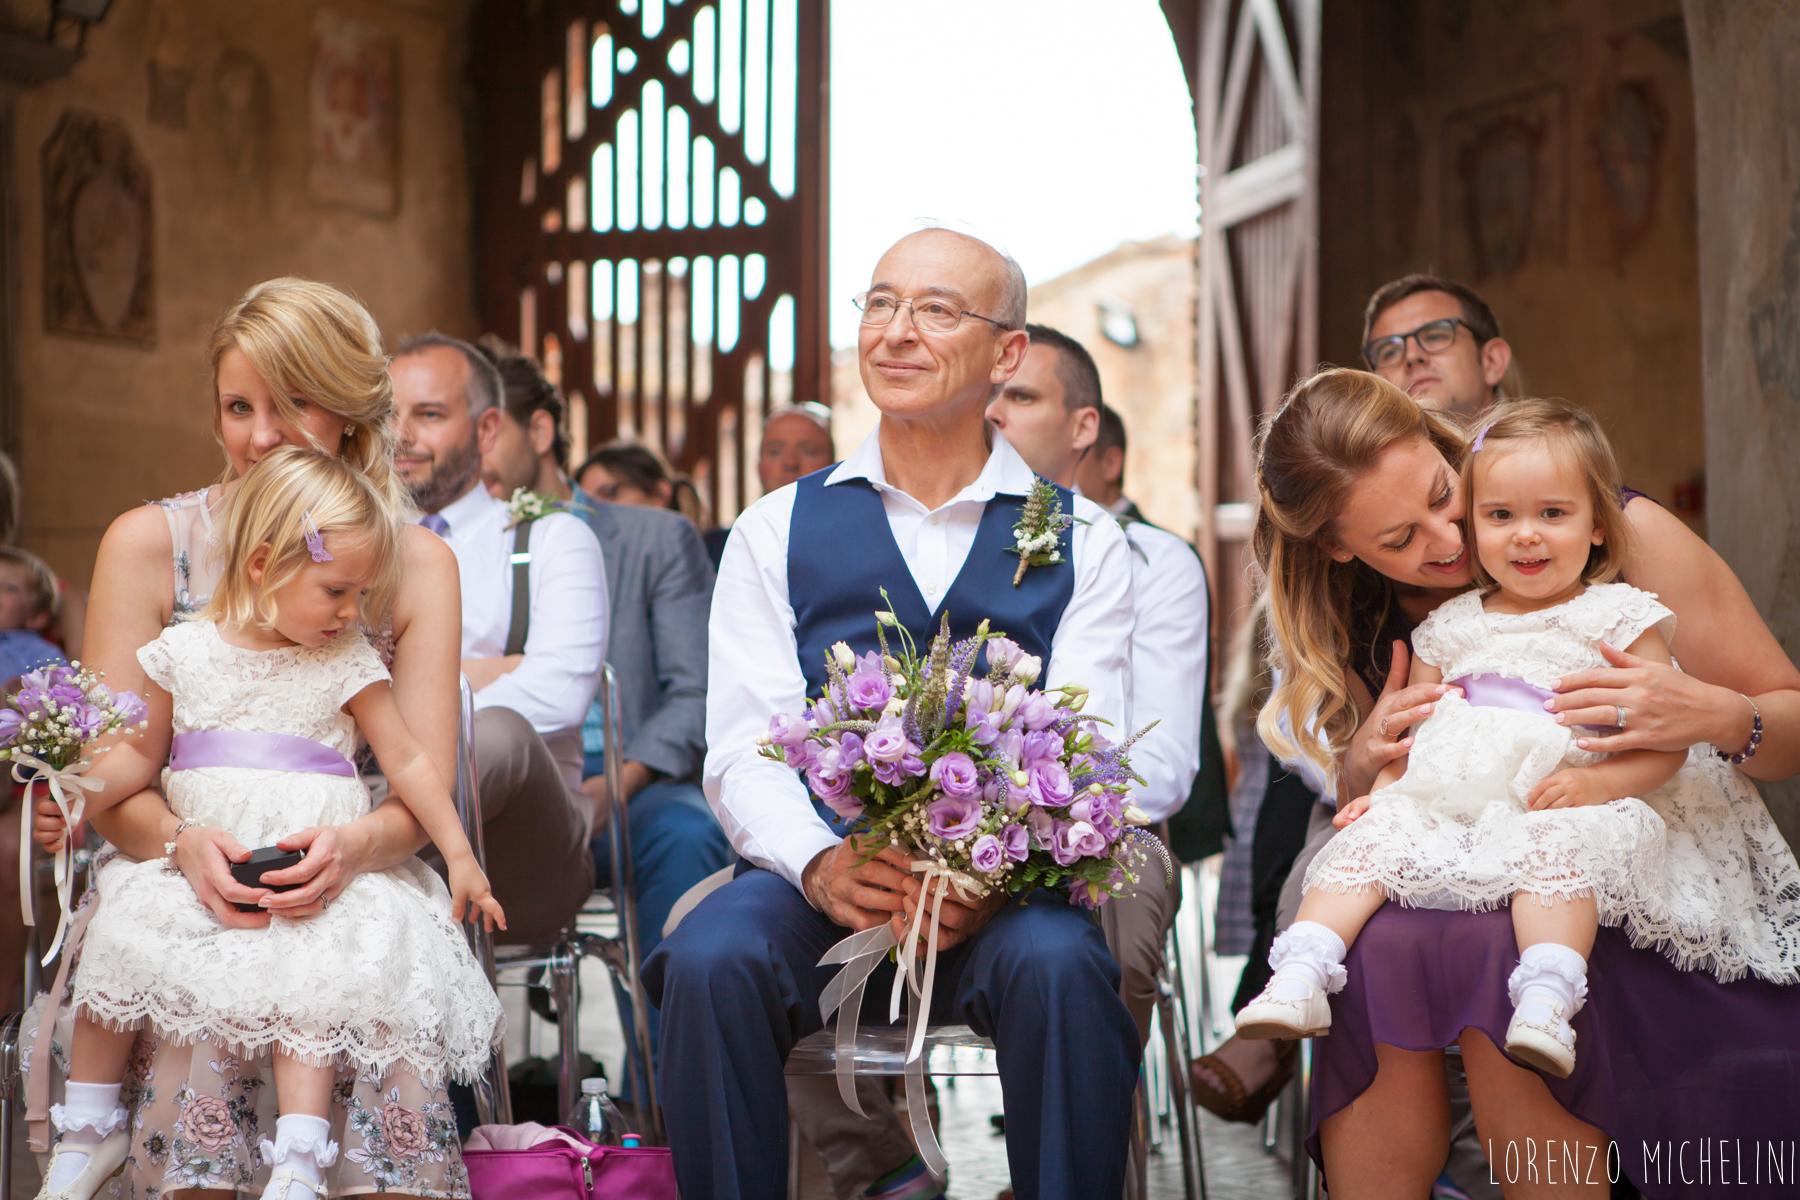 best-wedding-photographer-italy-fotografo-sposi-toscana-33